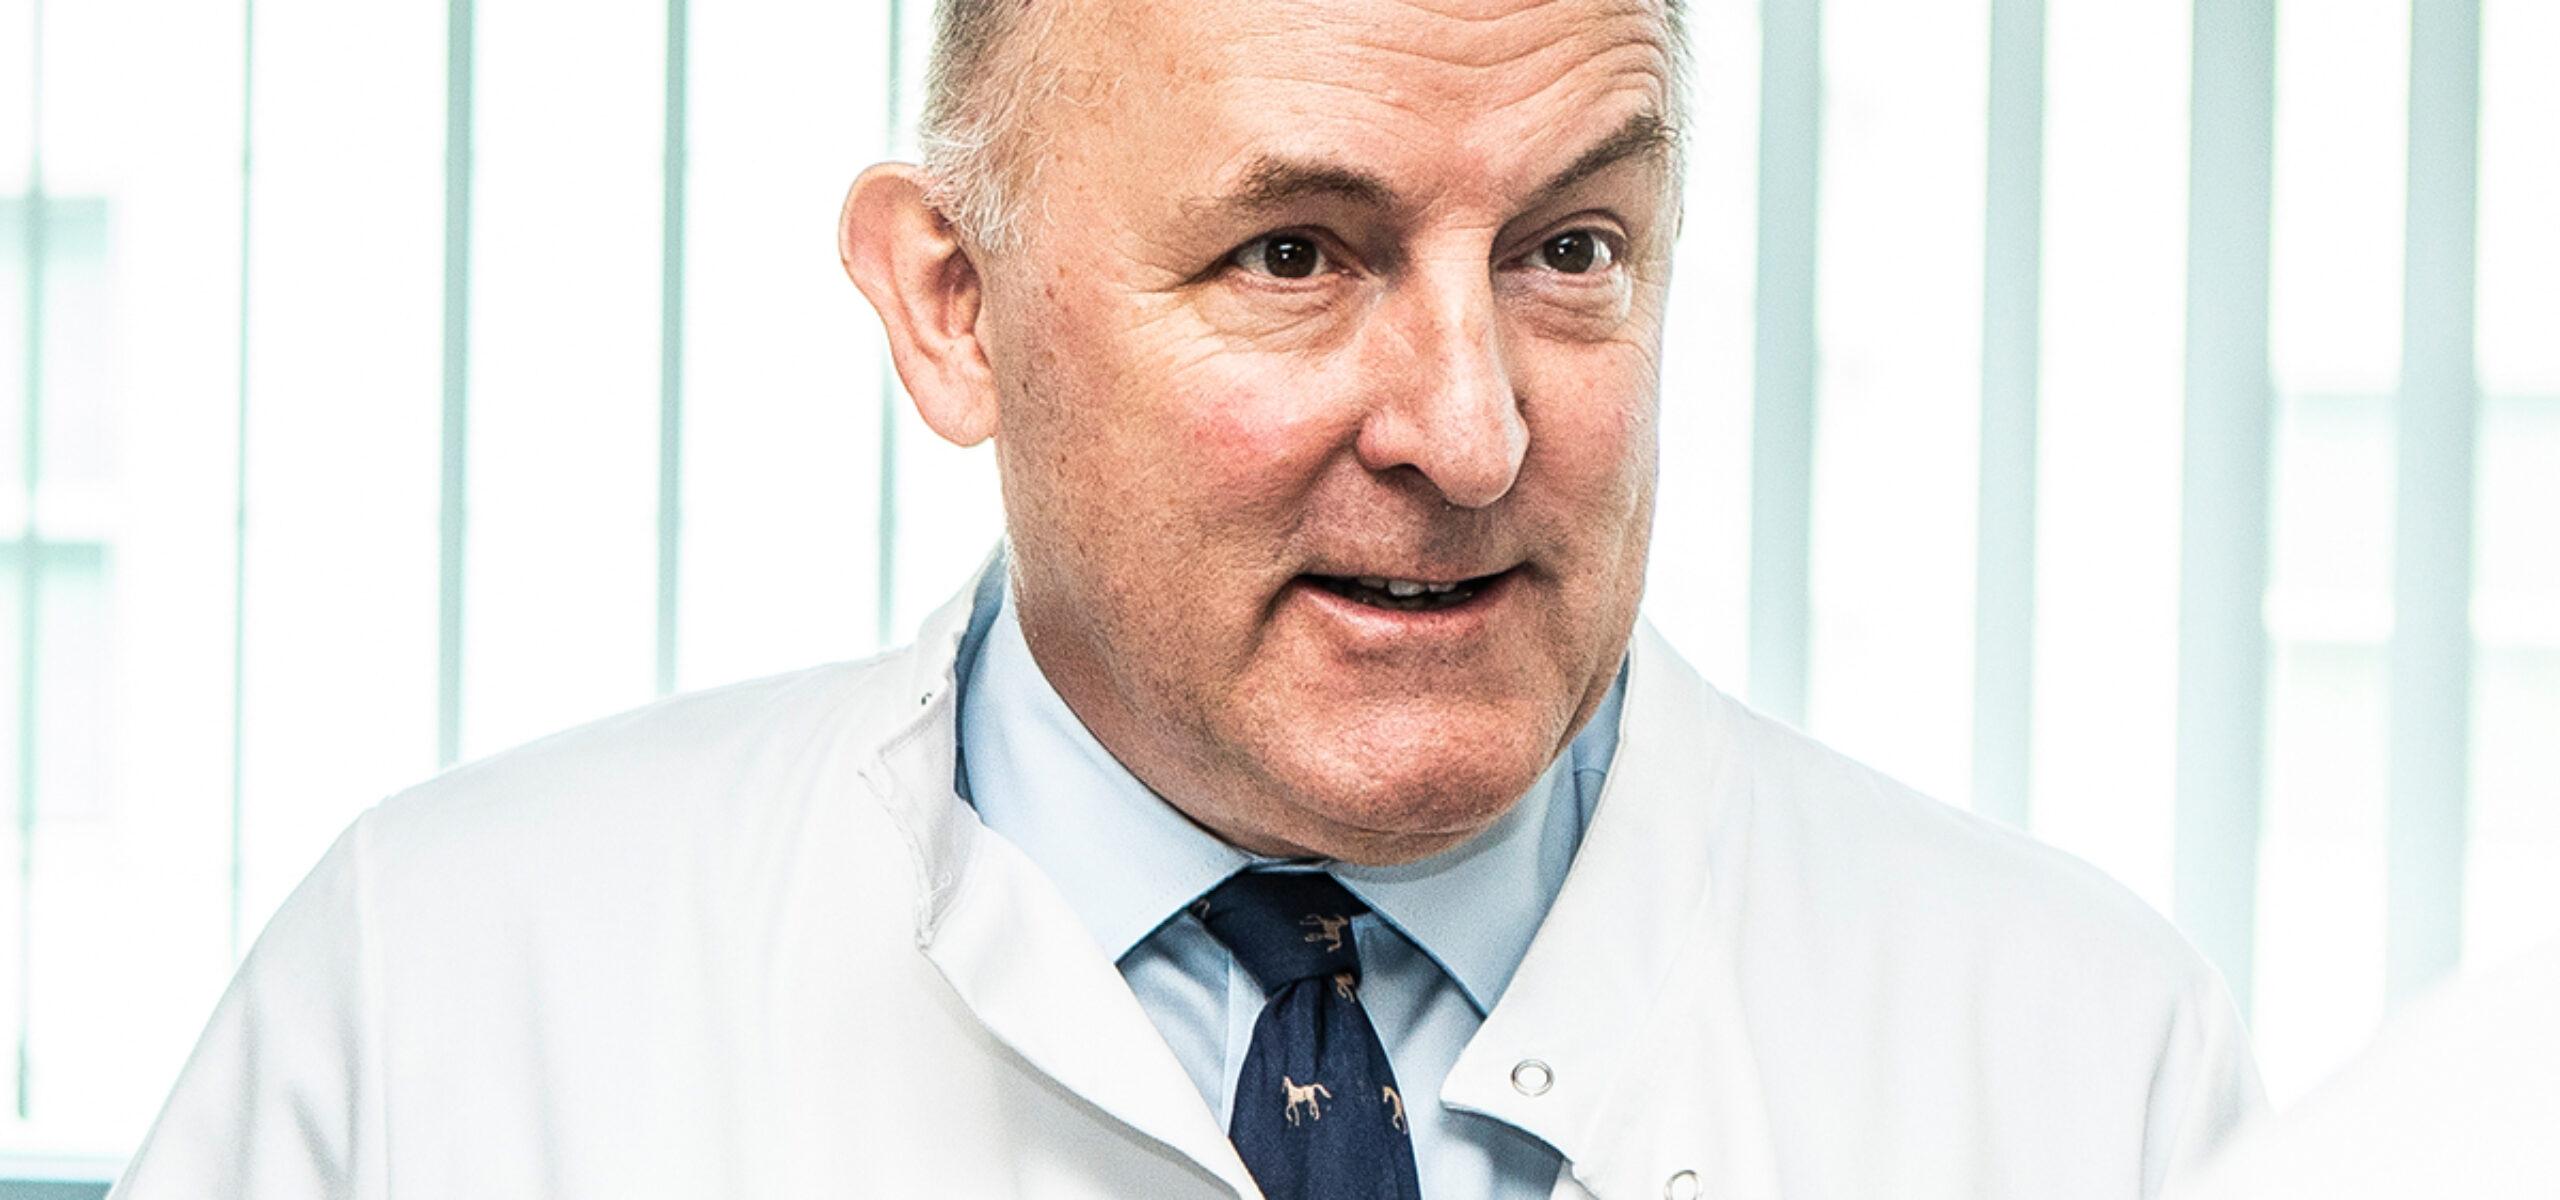 Professor Gareth Evans